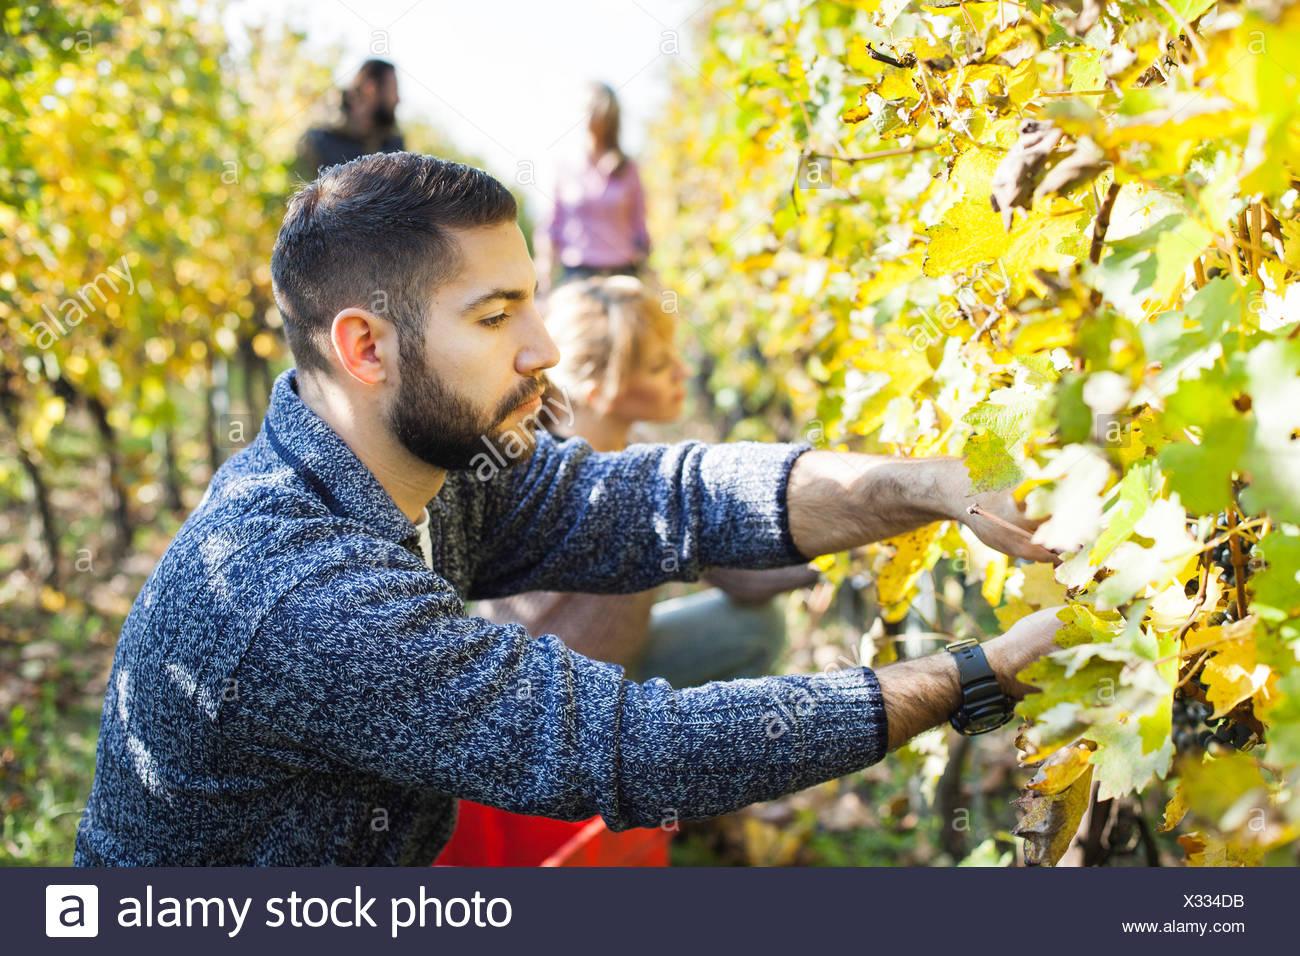 Friends harvesting grapes together in vineyard - Stock Image